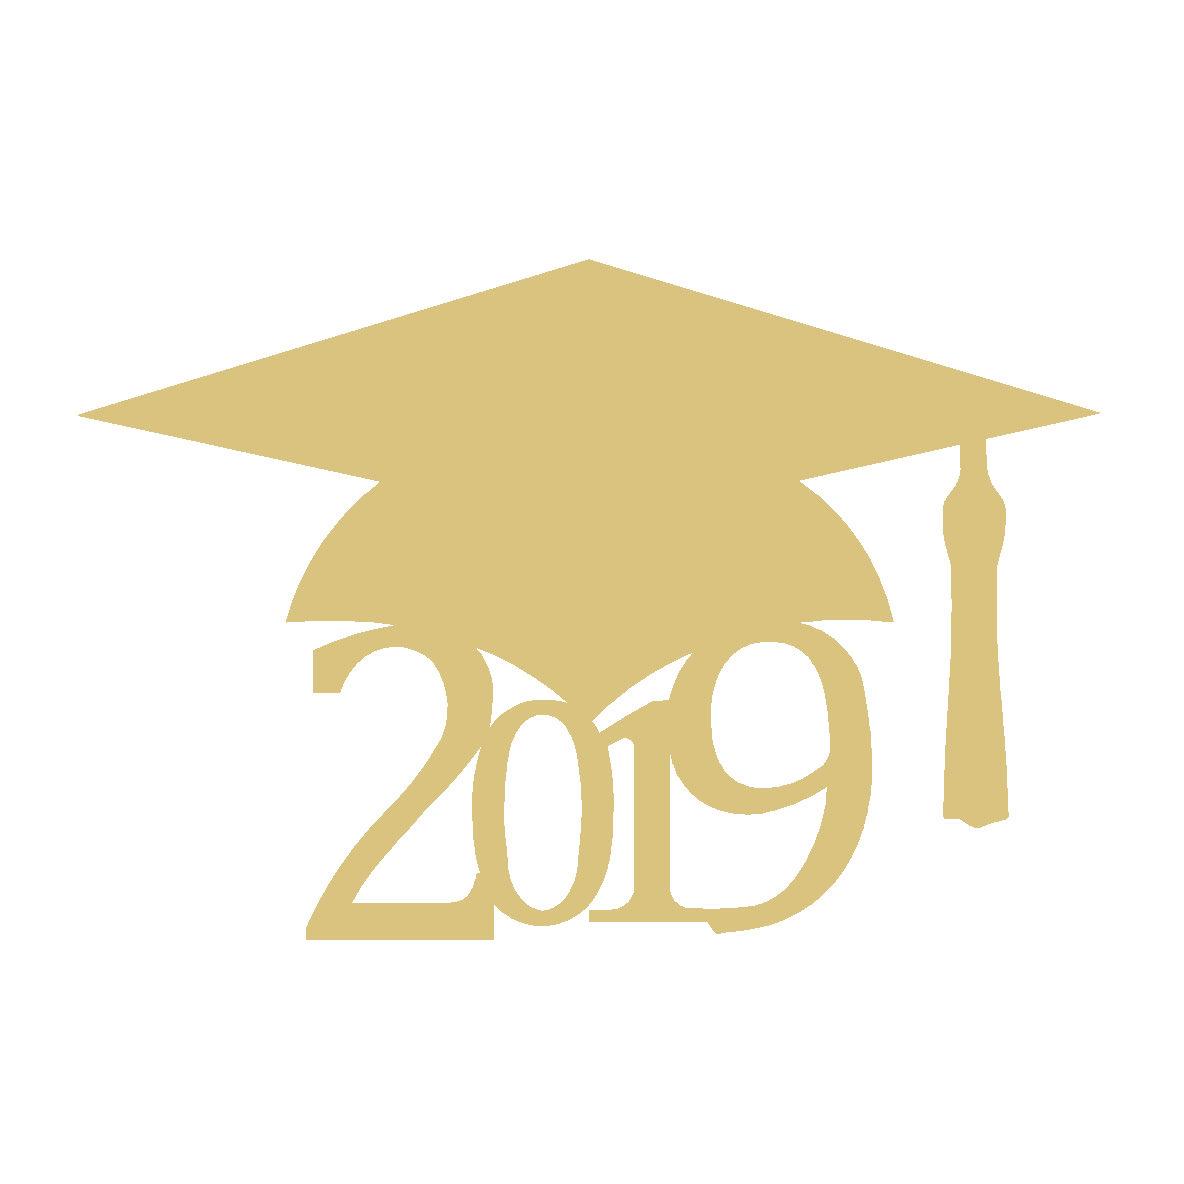 Graduation Cap 2019 Cutout Style 1 clip black and white stock